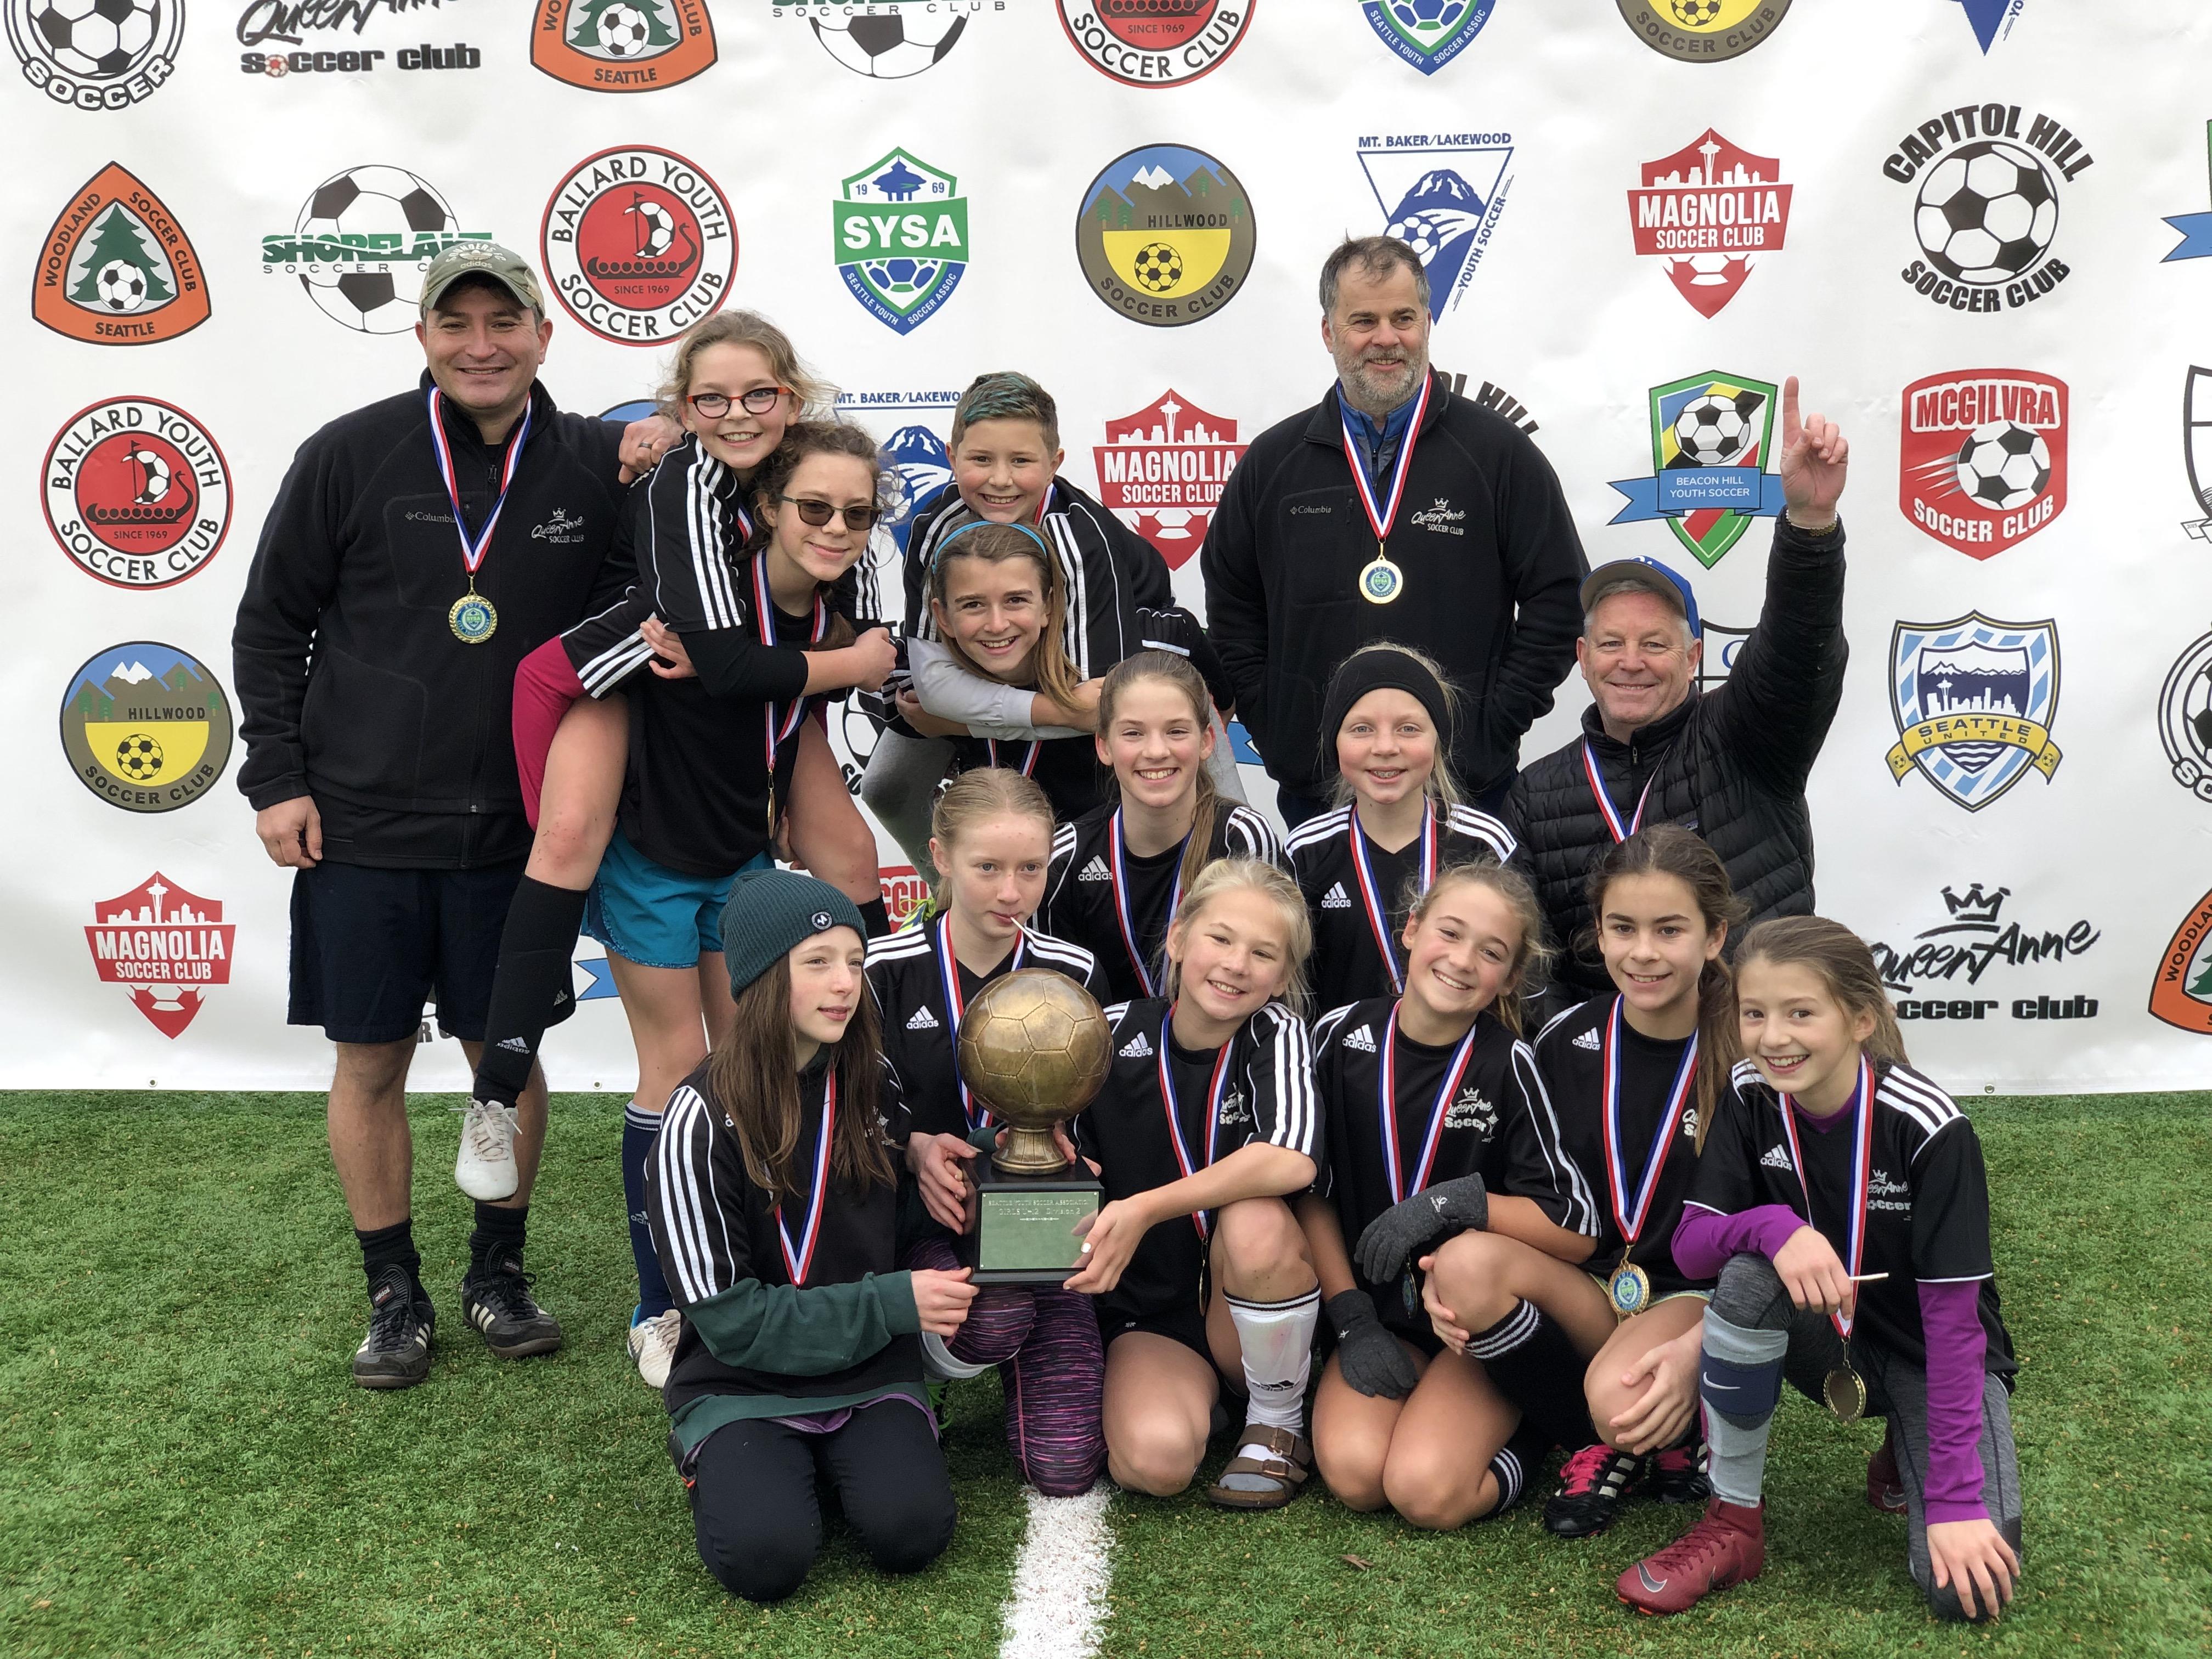 Queen Anne Soccer Kangaros